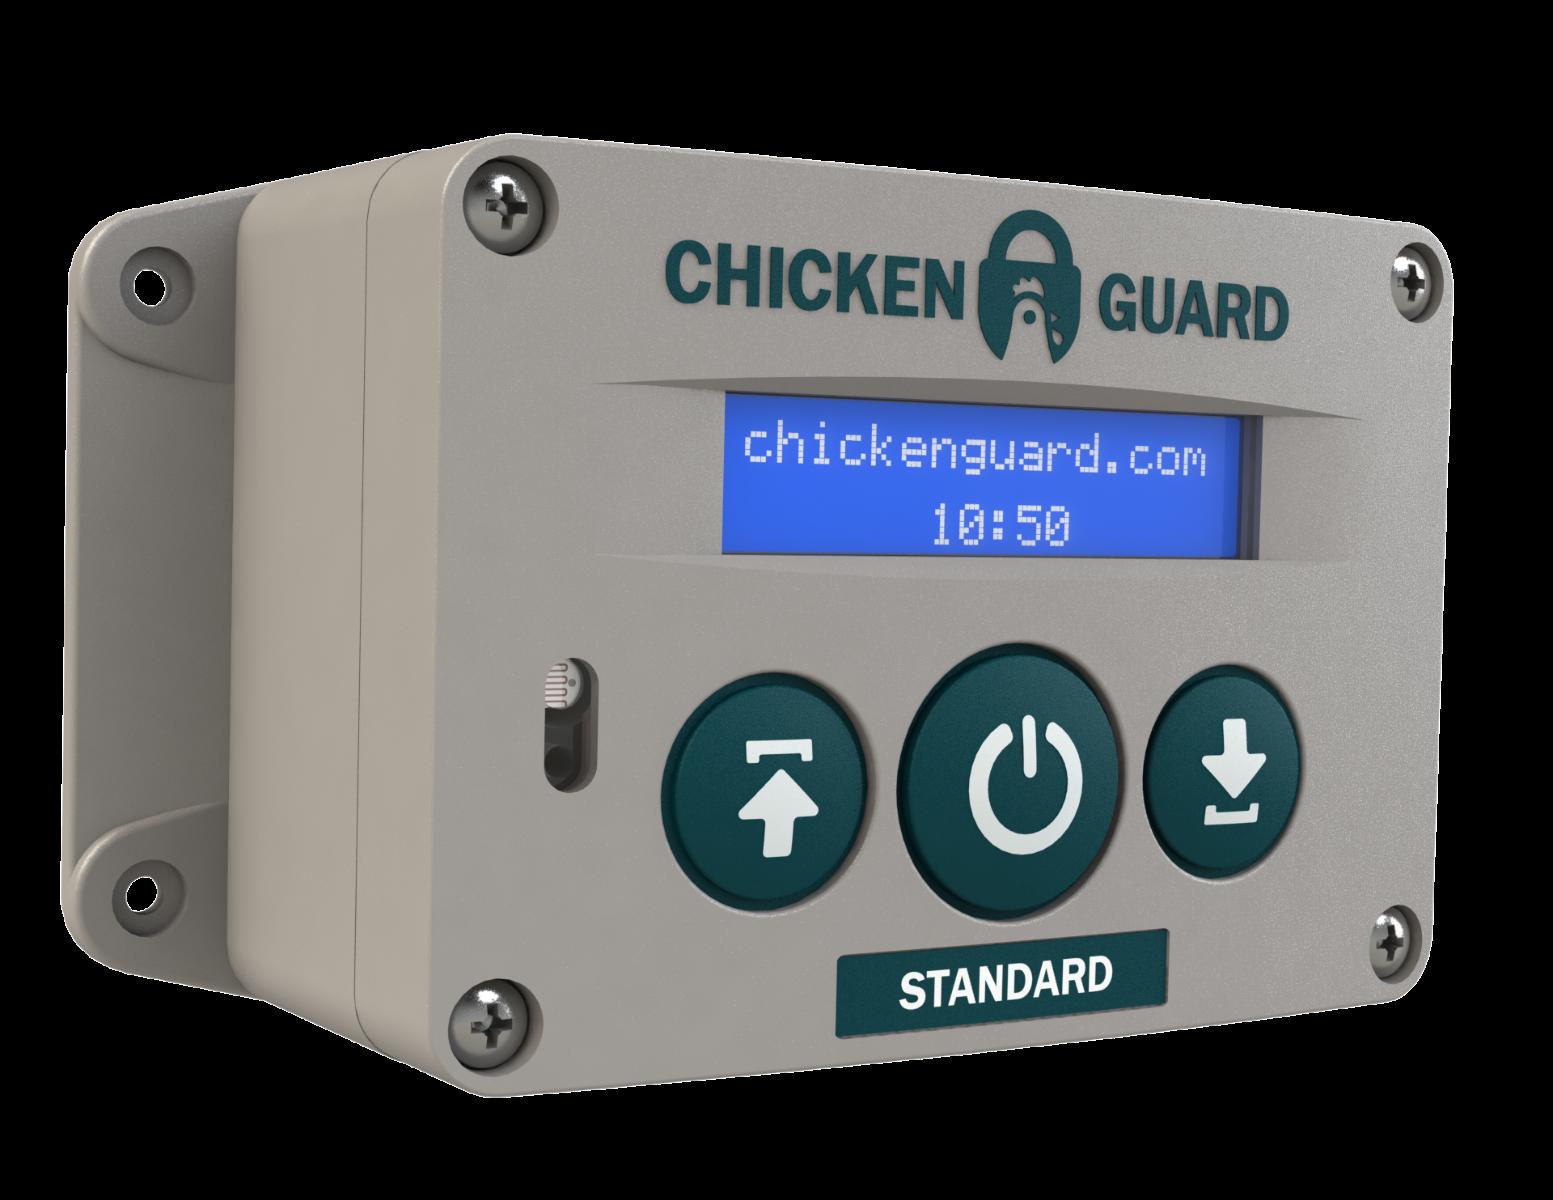 ChickenGuard Standard